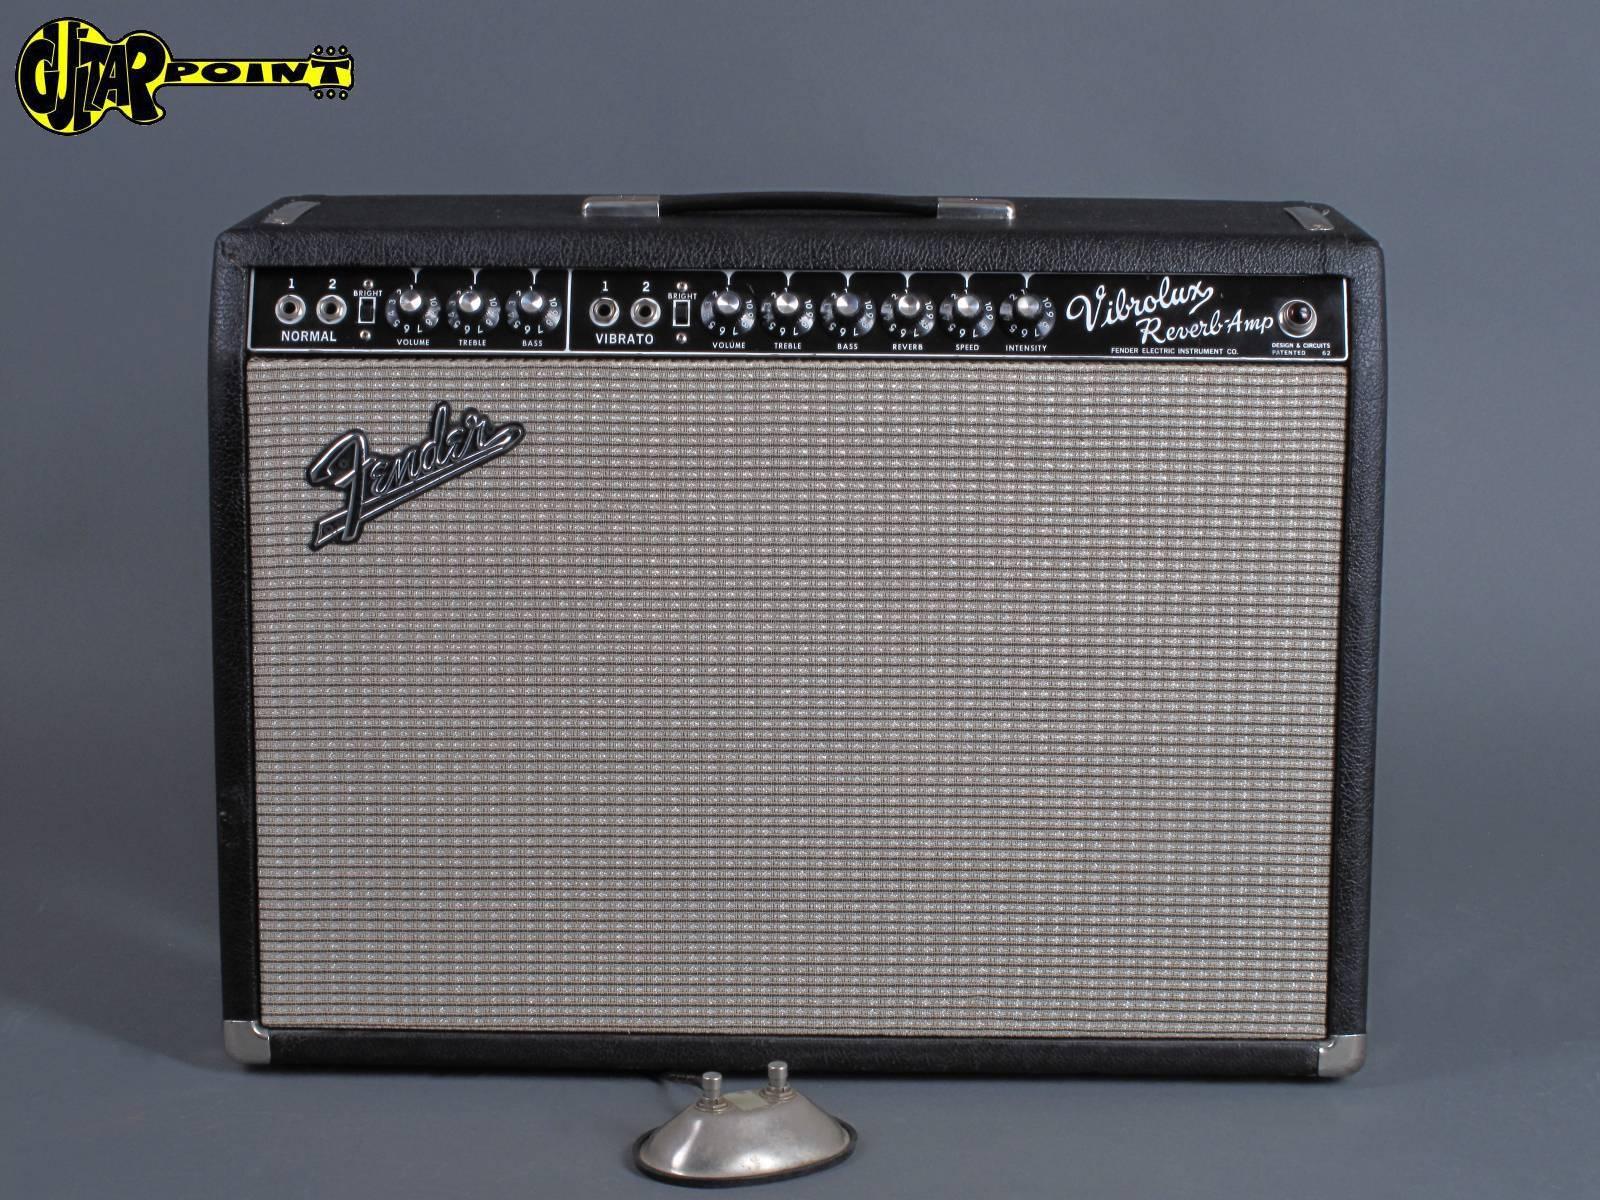 1965 Fender Vibrolux  Reverb Amp - Blackface